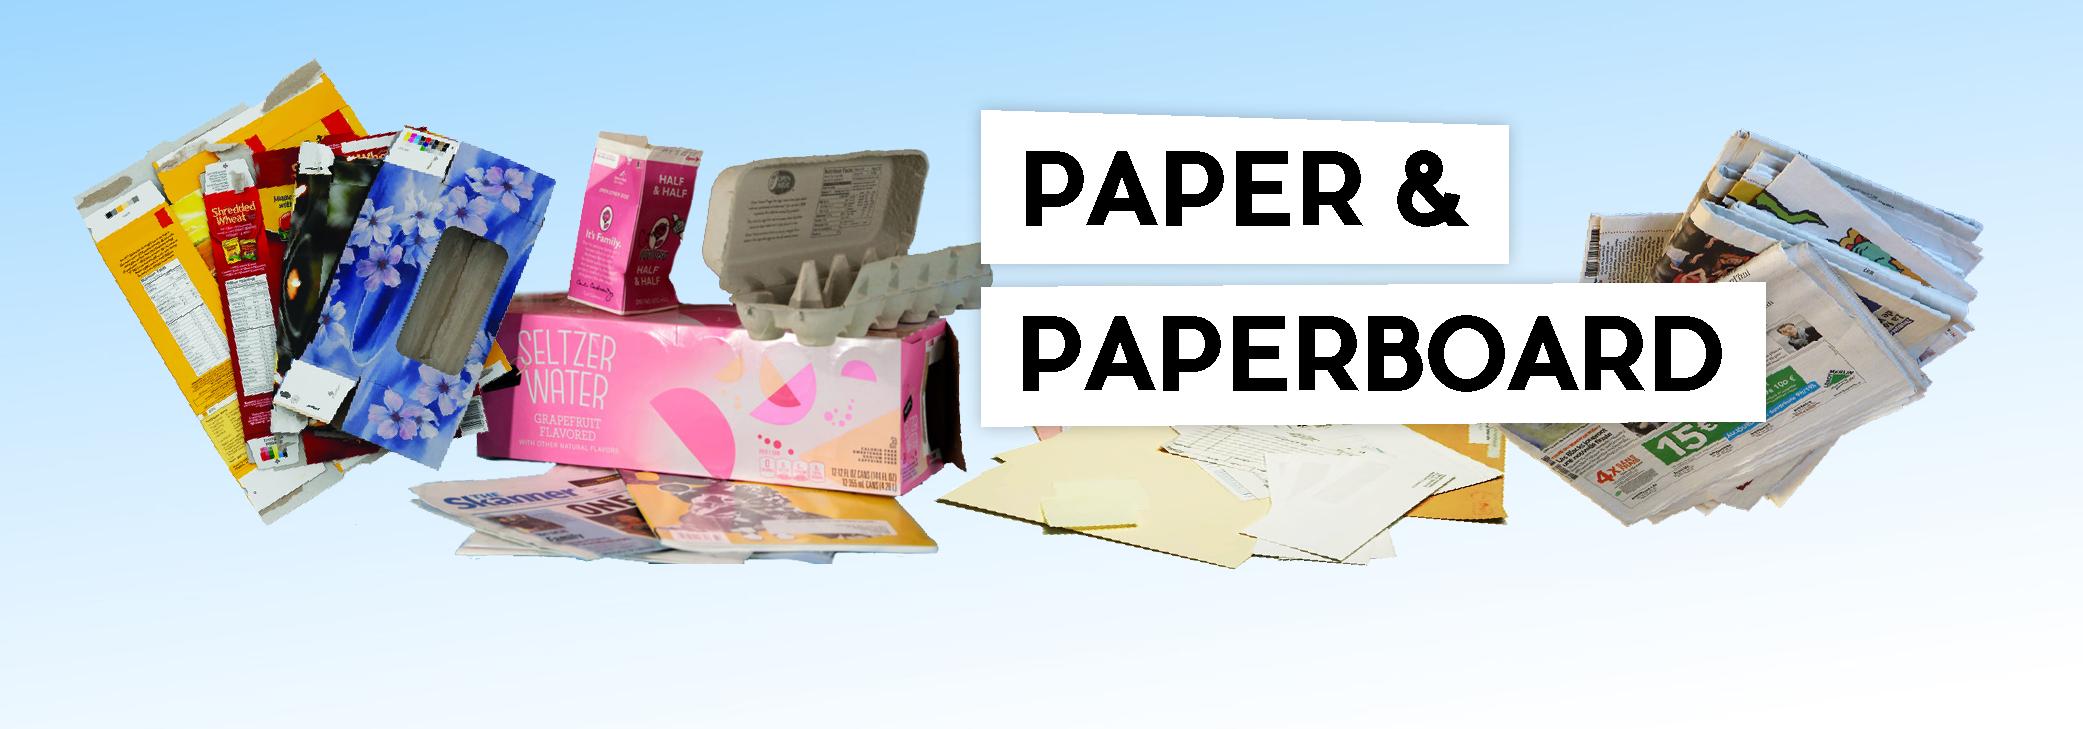 PAPER link